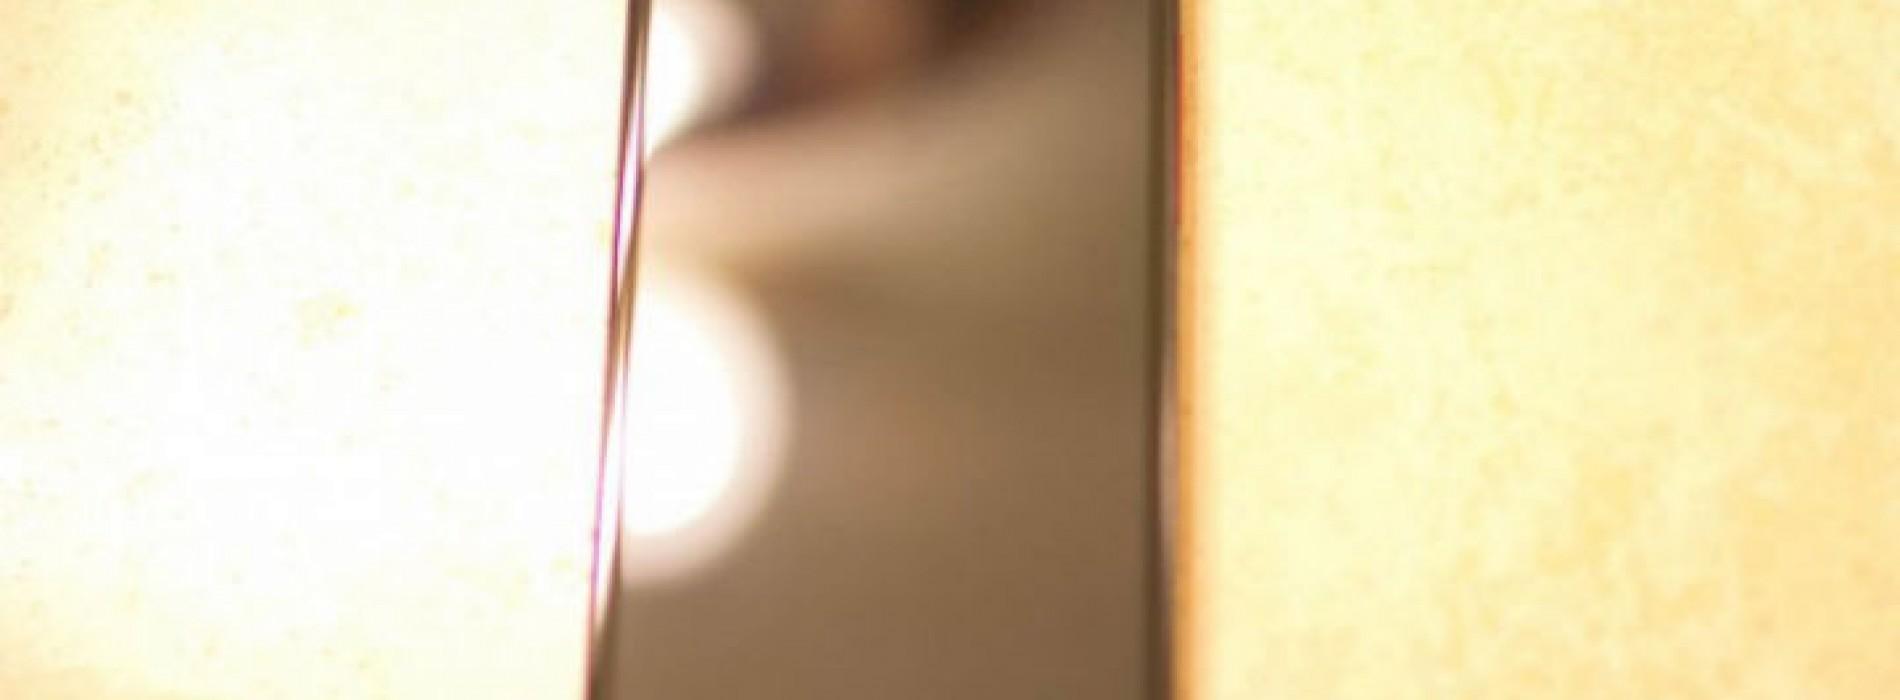 5-inch HTC DLX pictured with Verizon branding